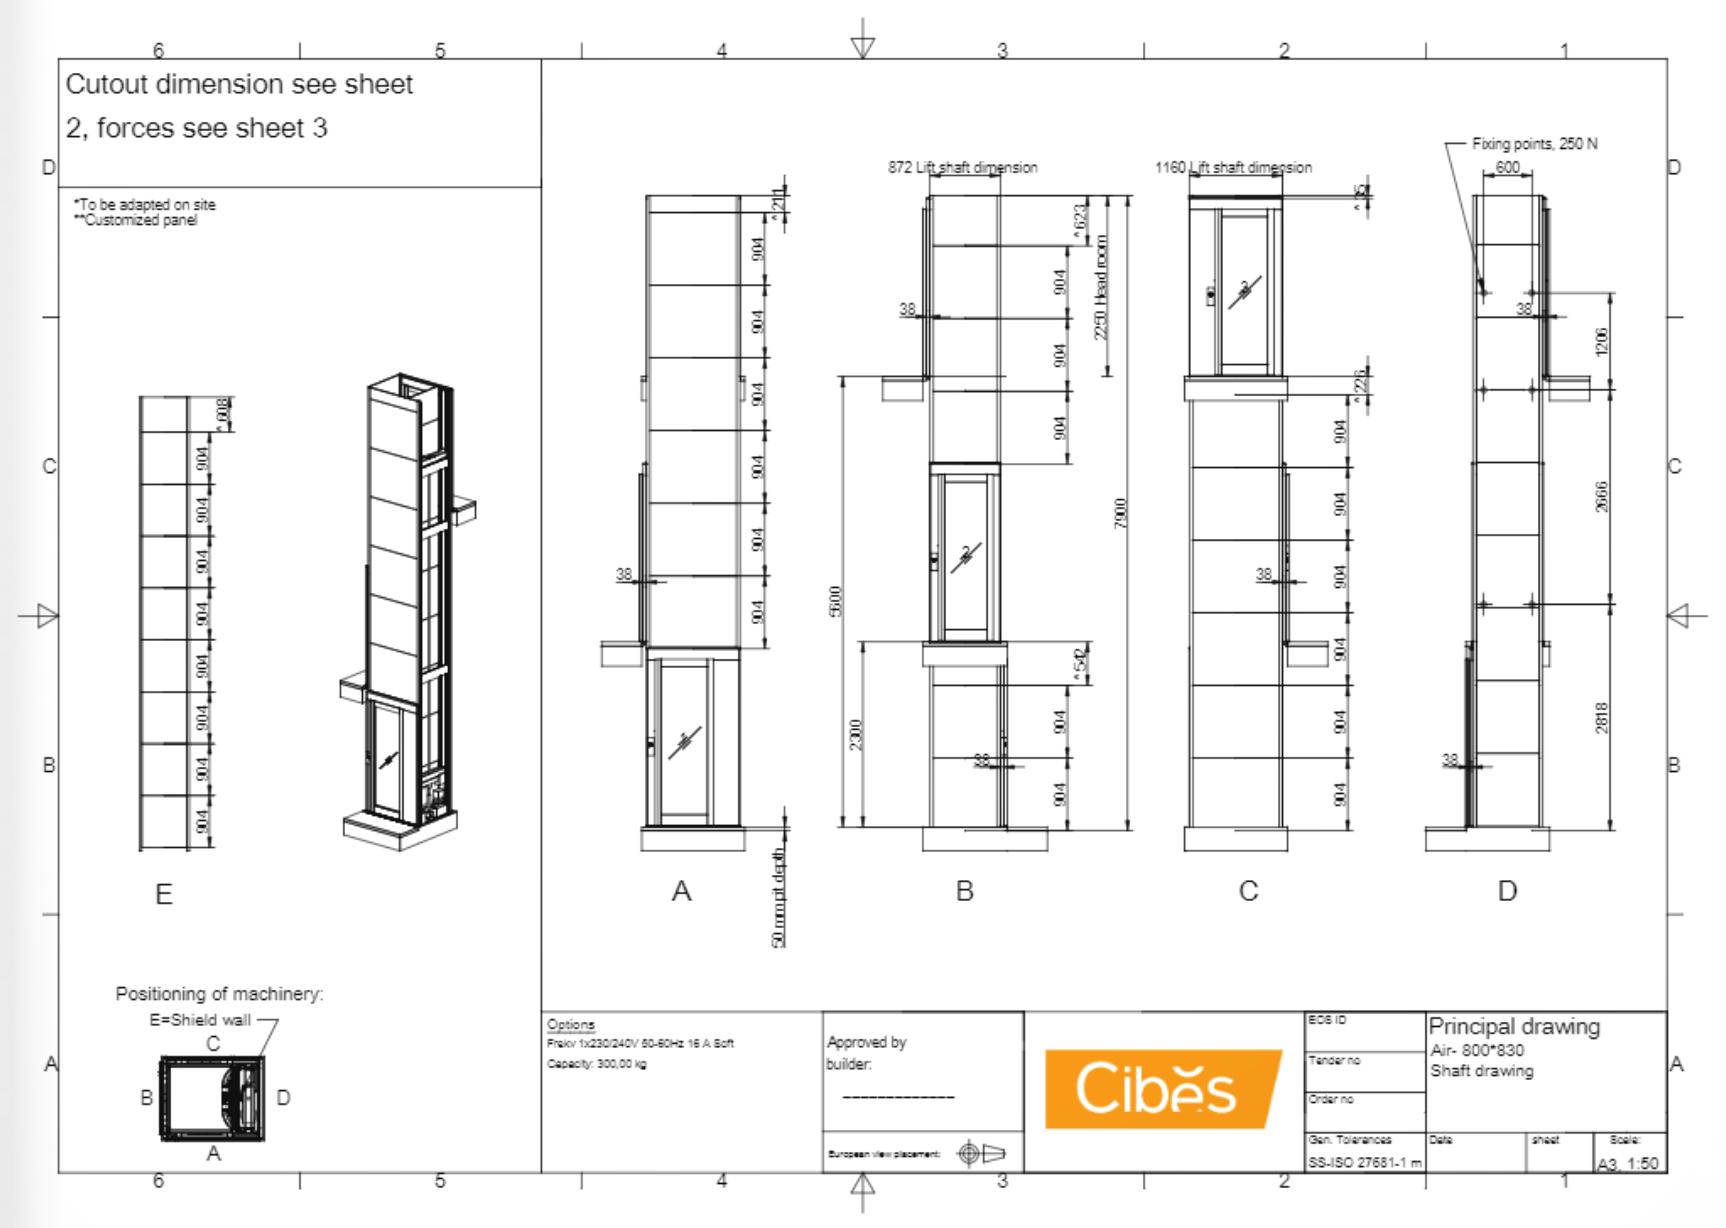 Cibes lift Size S1 800x830